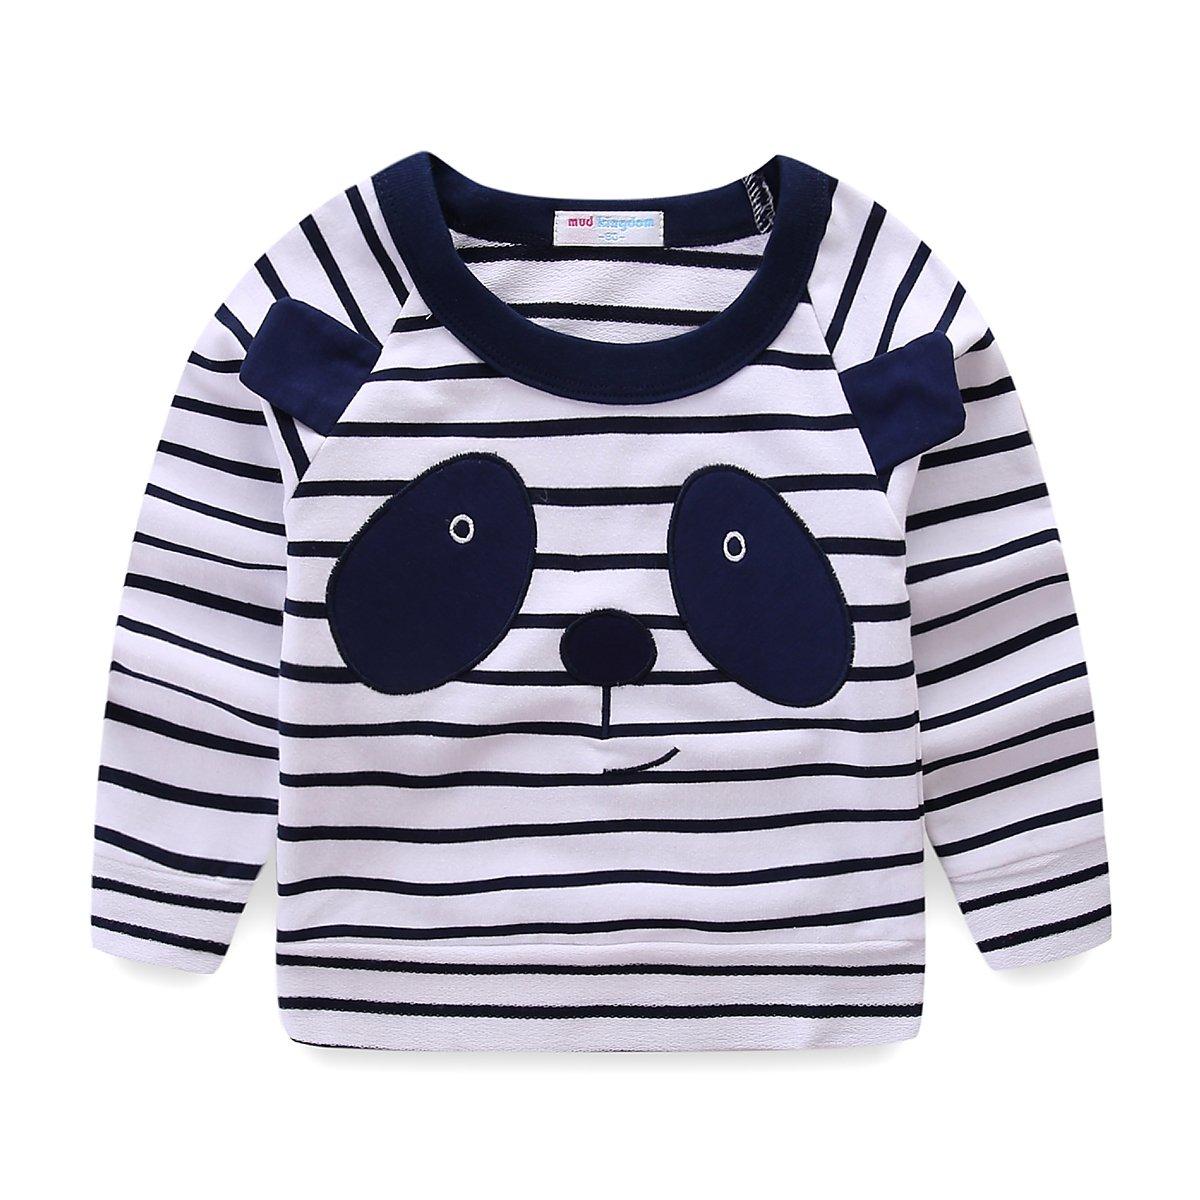 Mud Kingdom Toddler Kids Striped Panda Costume Sweater S-S0202